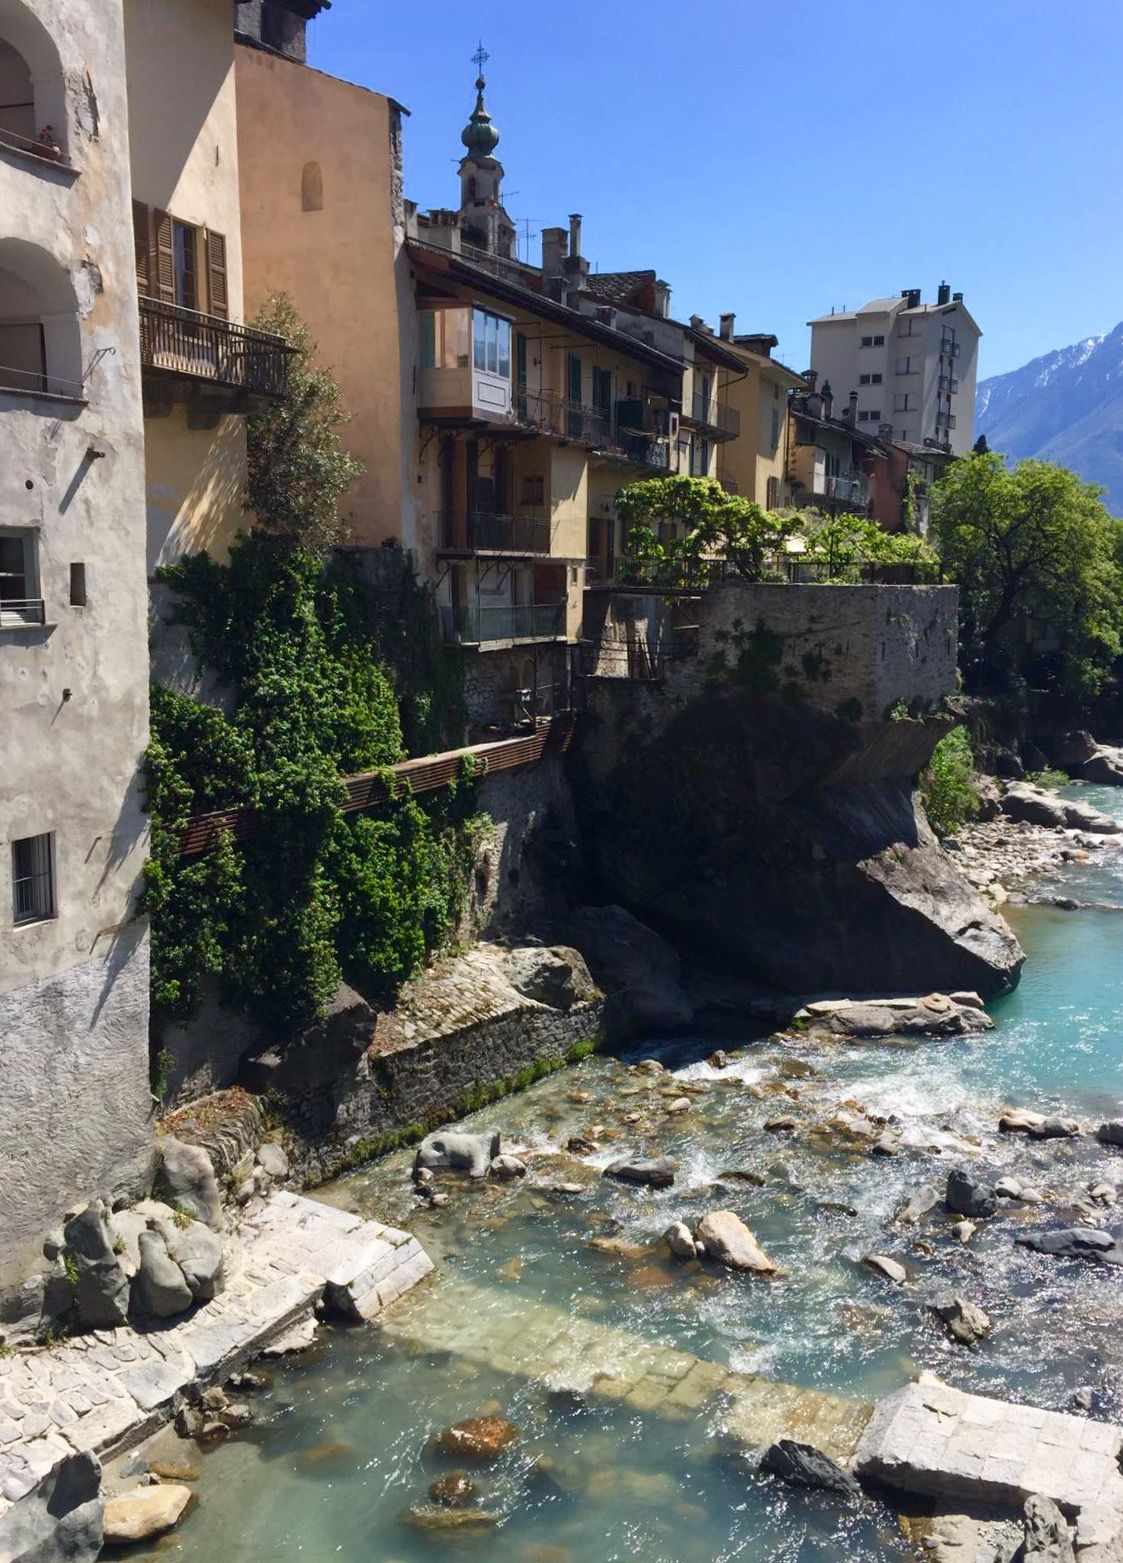 Chiavenna/Italy | Nature travel, House styles, Travel